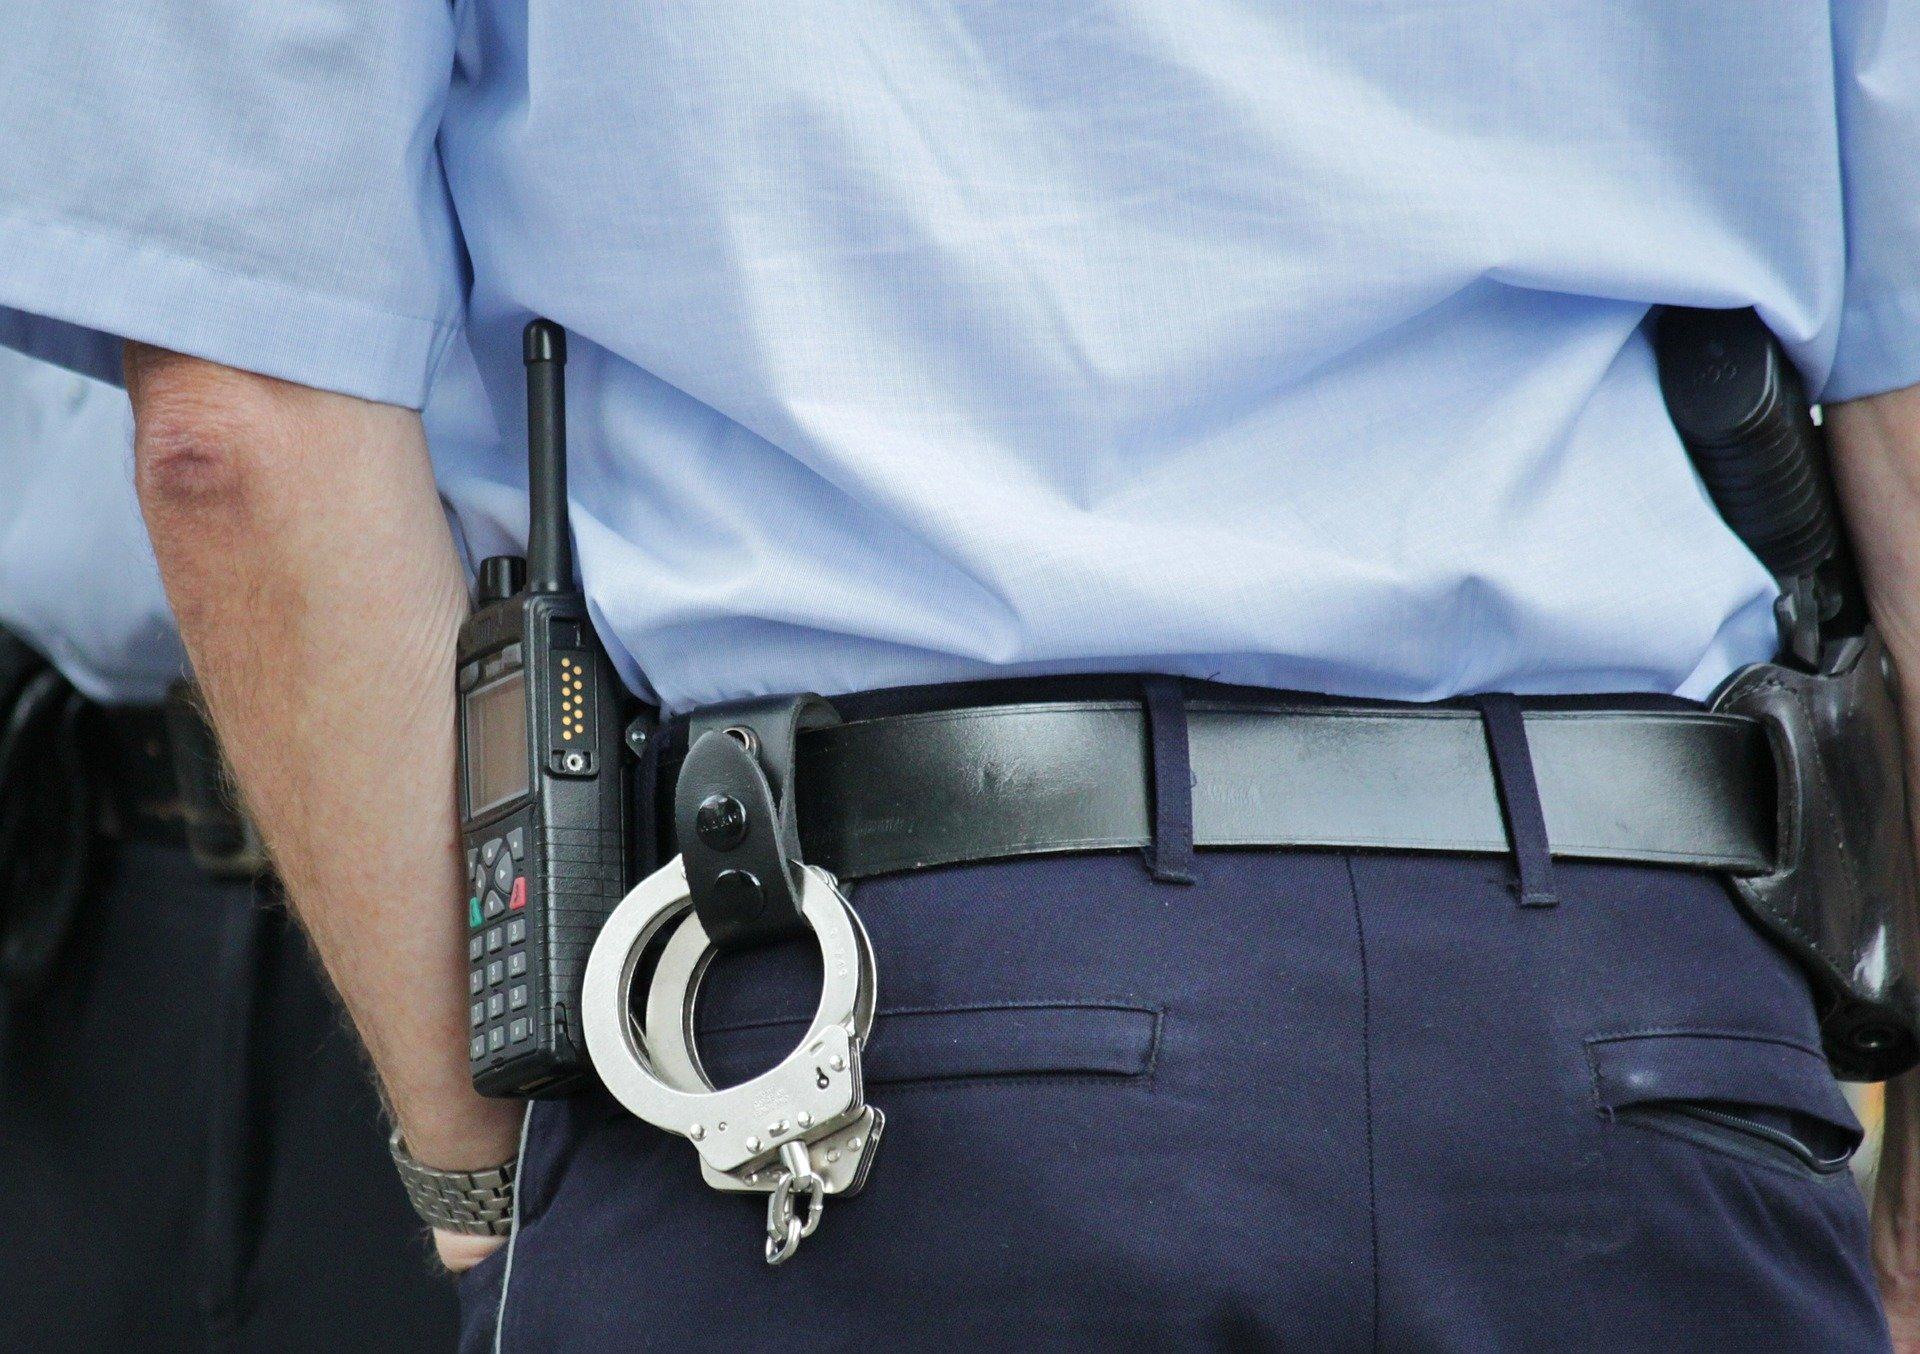 40-Jähriger beschäftigt Polizei